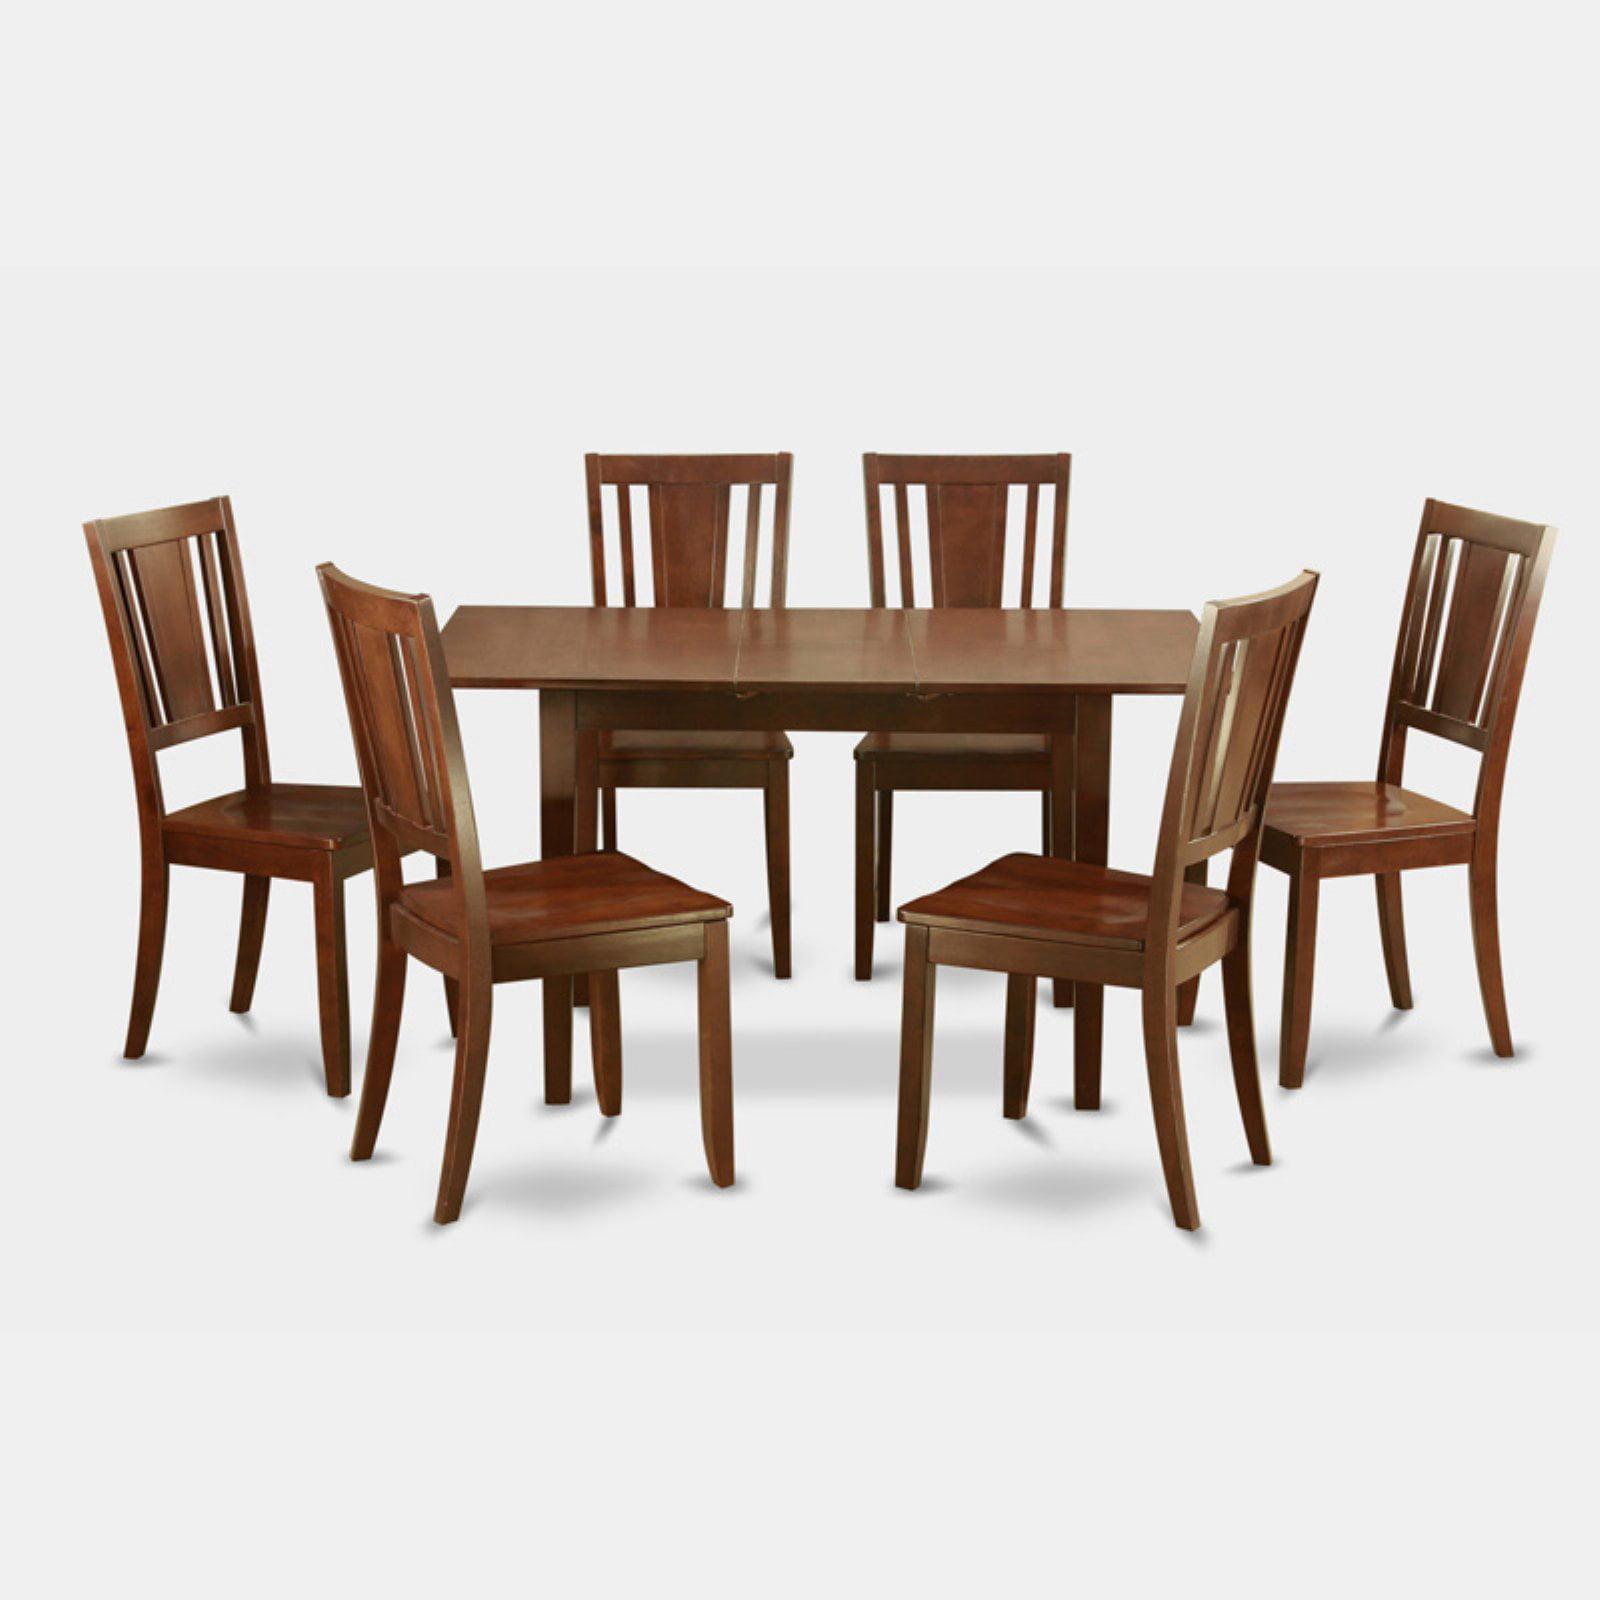 East West Furniture Norfolk 7 Piece Scotch Art Dining Table Set